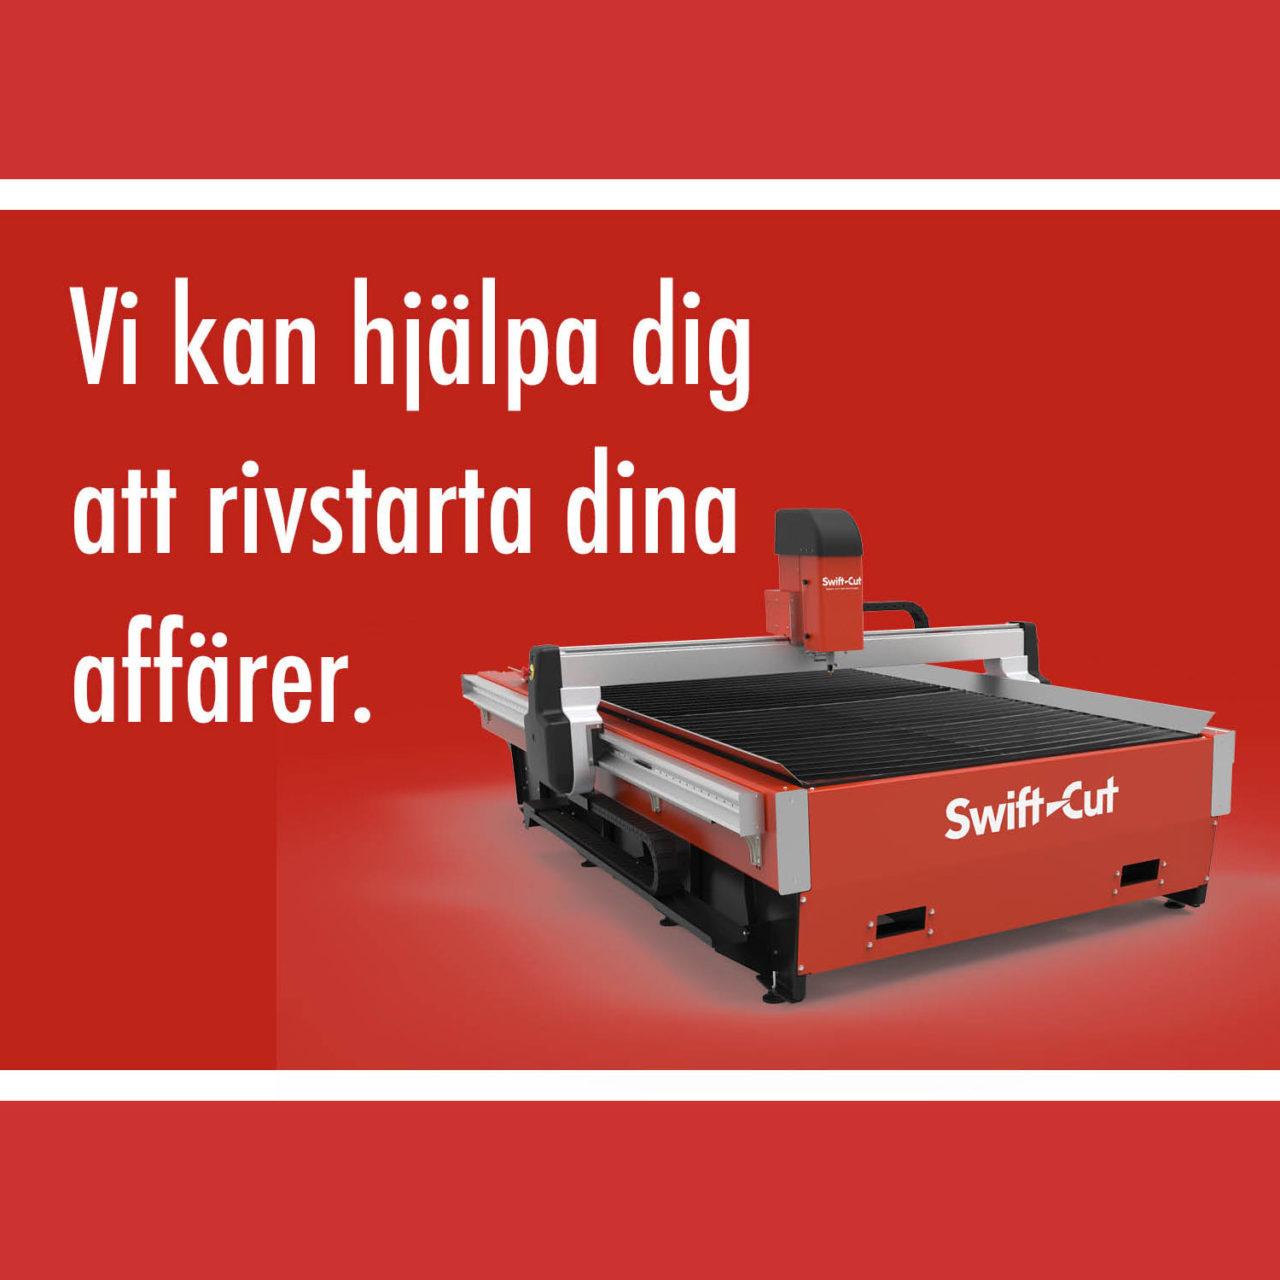 SwiftCut plasmaskärmaskin